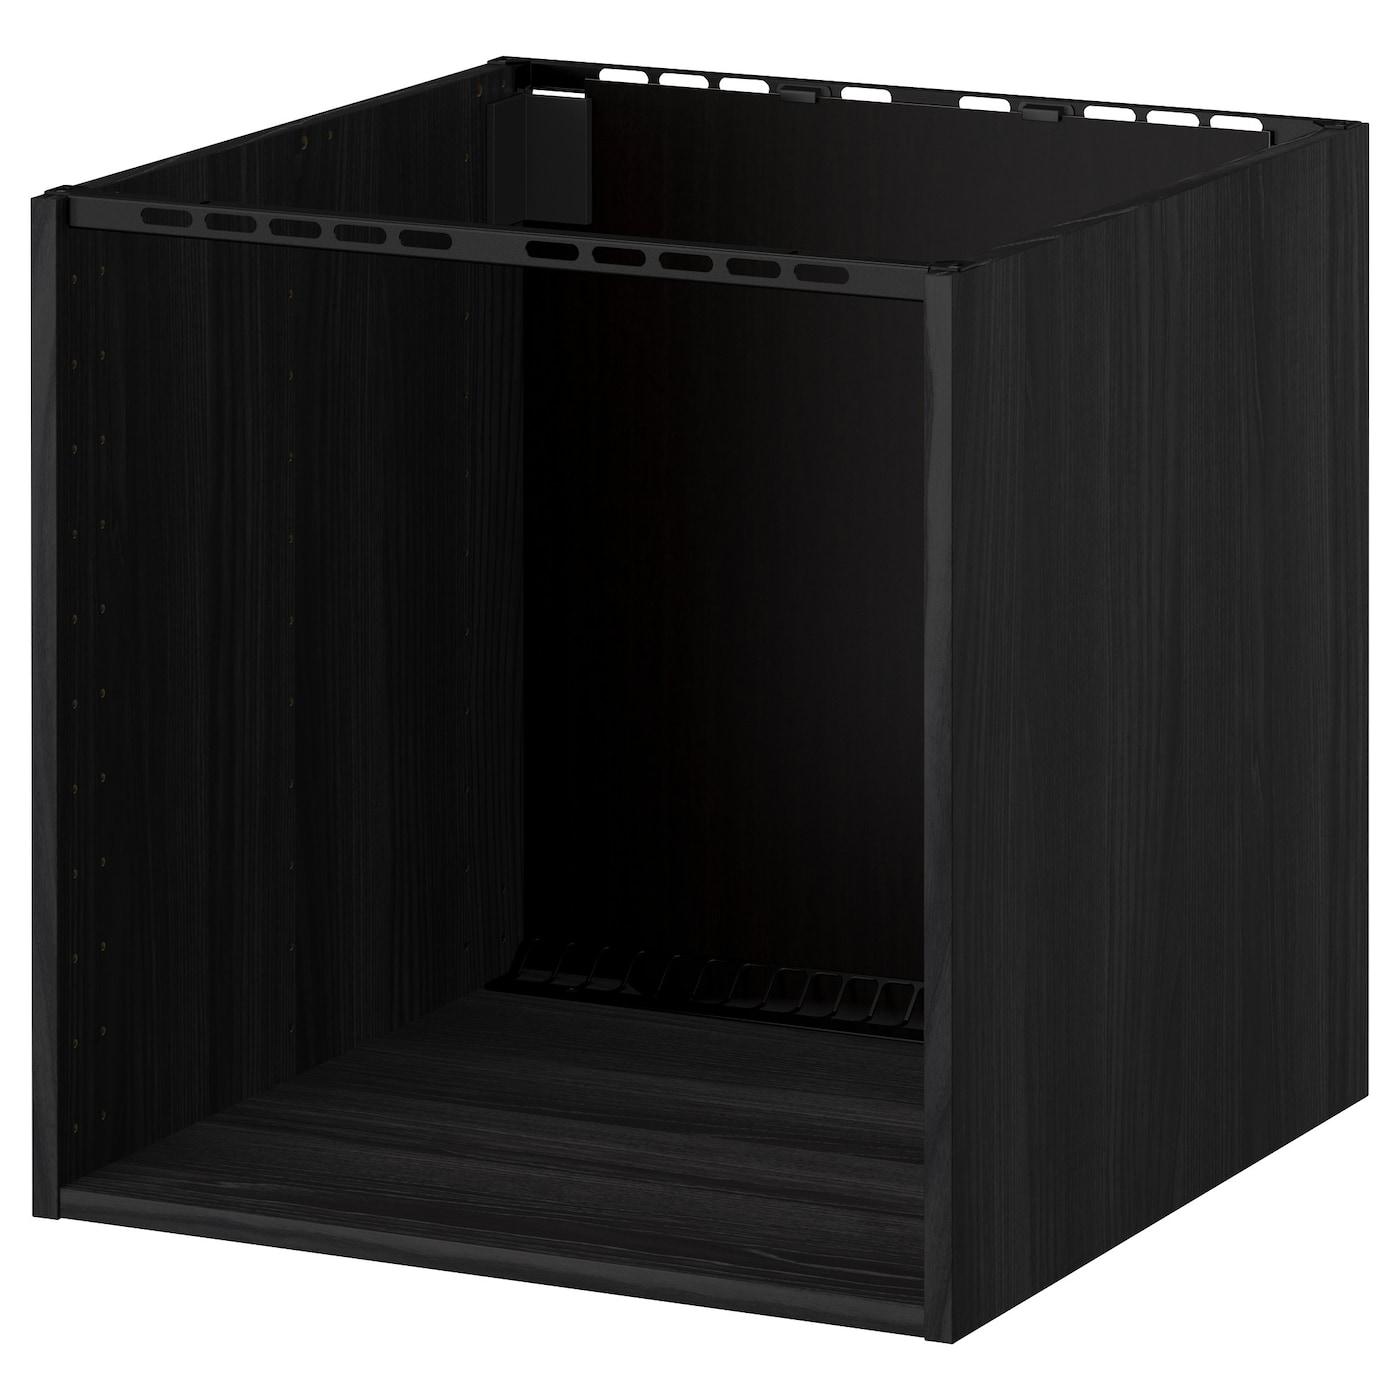 Metod Cabinet For Built In Hob Sink Wood Effect Black